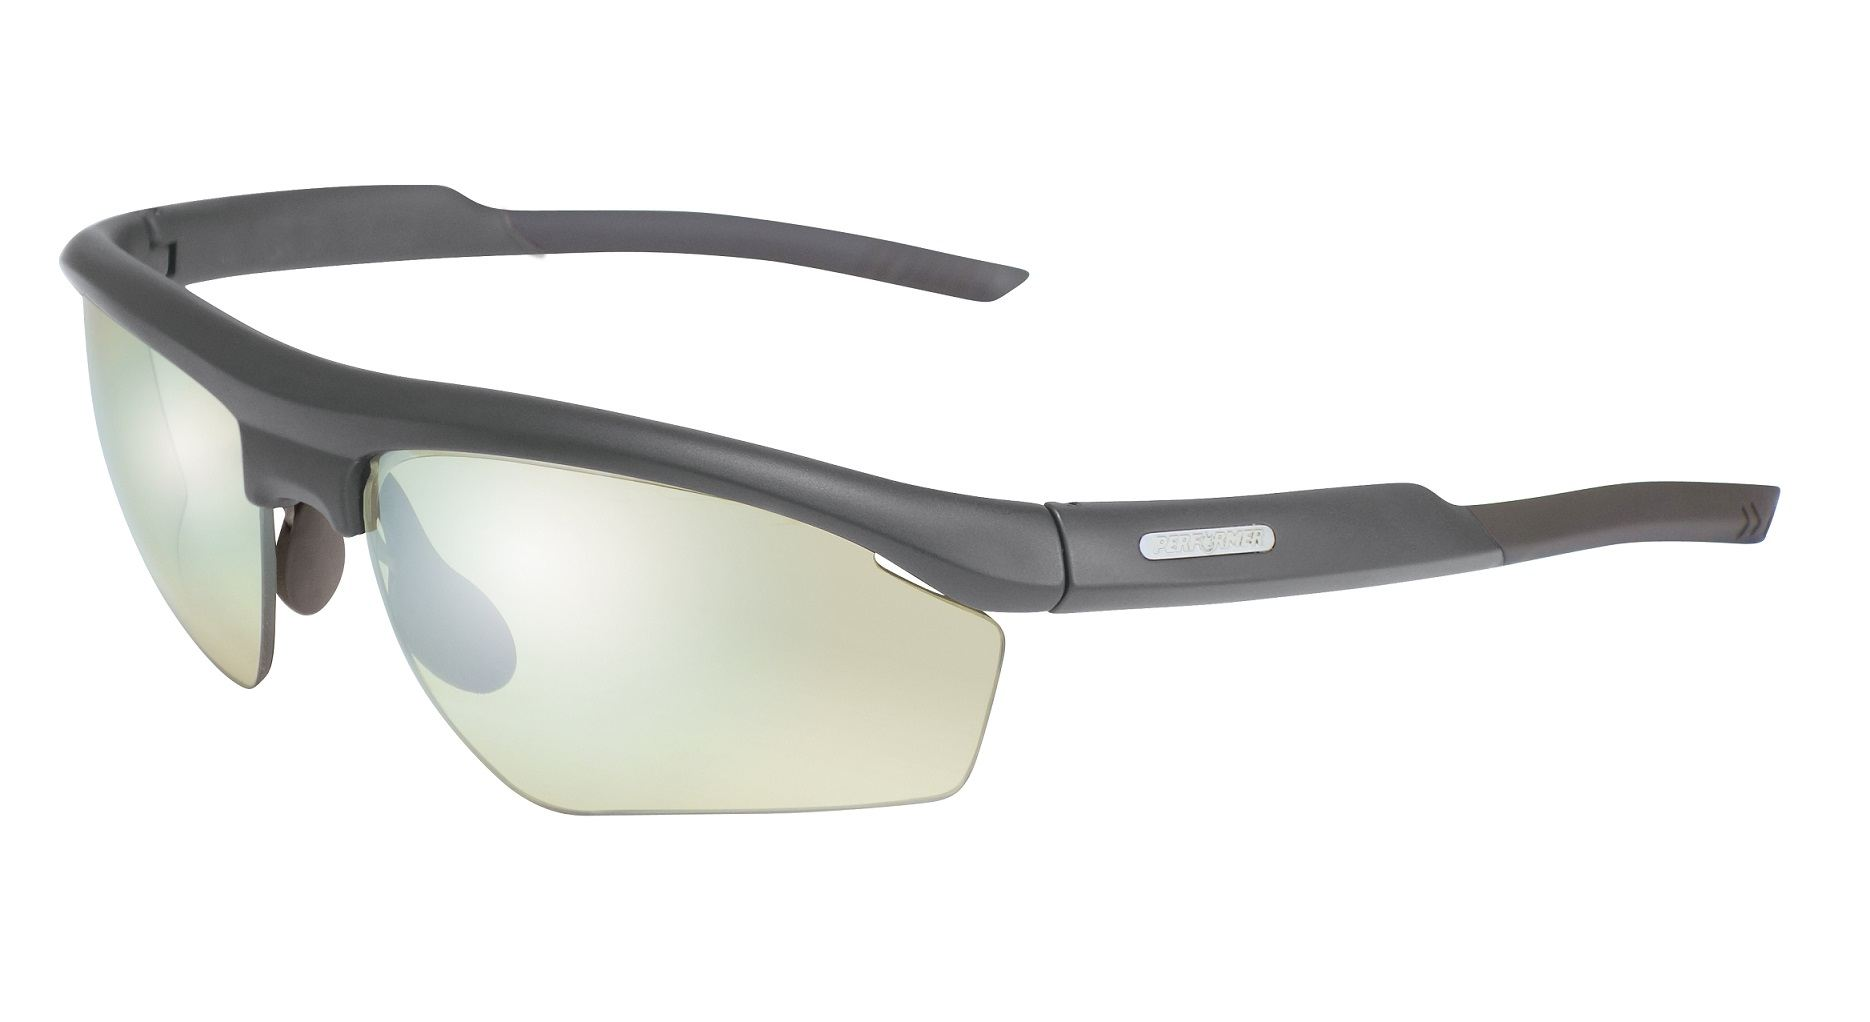 Performer Modell TTR 2.0 212 Sportbrille,Bikerbrille, Sonnenbrille